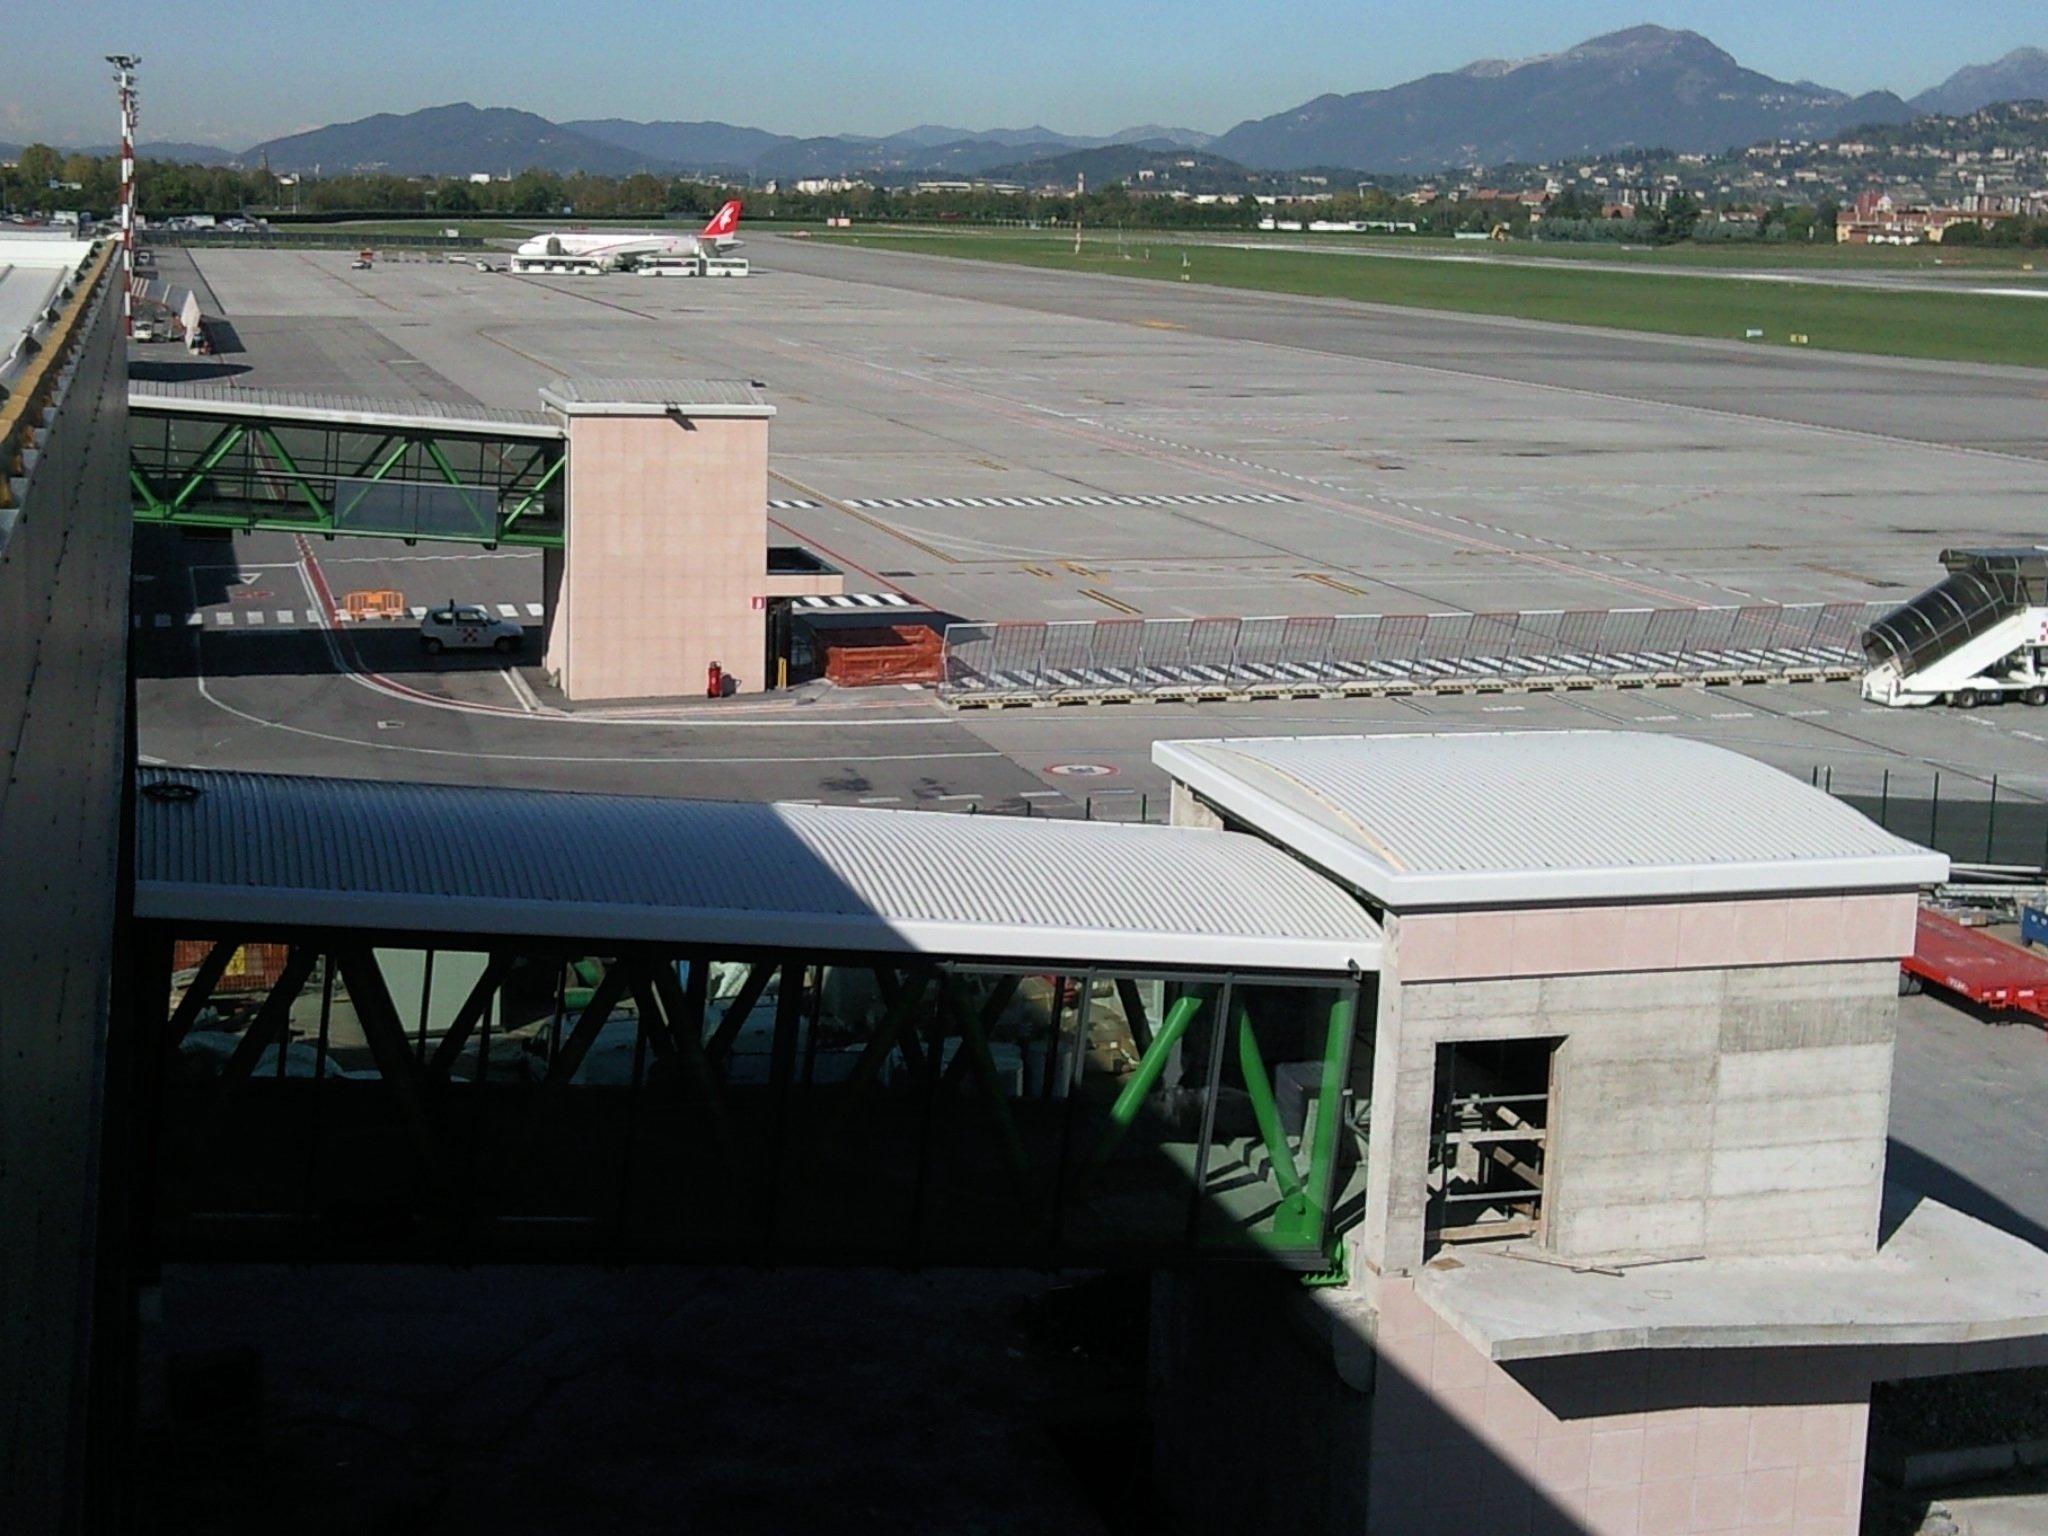 Aeroporto Orio : Zzzleepandgo bgy orio al serio u updated prices